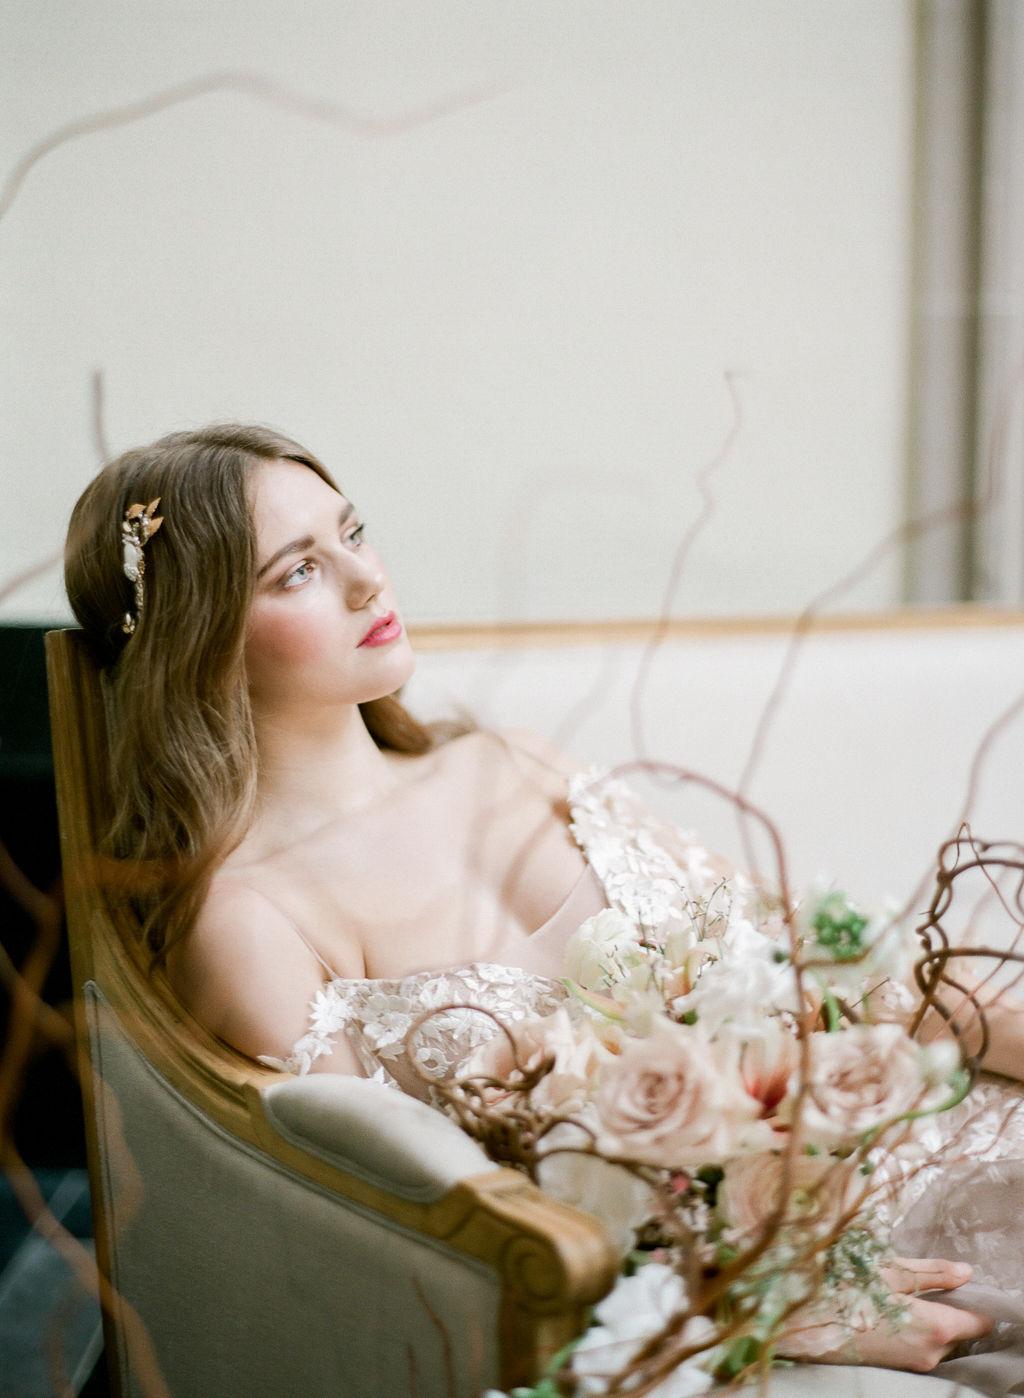 artiese-ago-wedding-editorial-000423680008.jpg